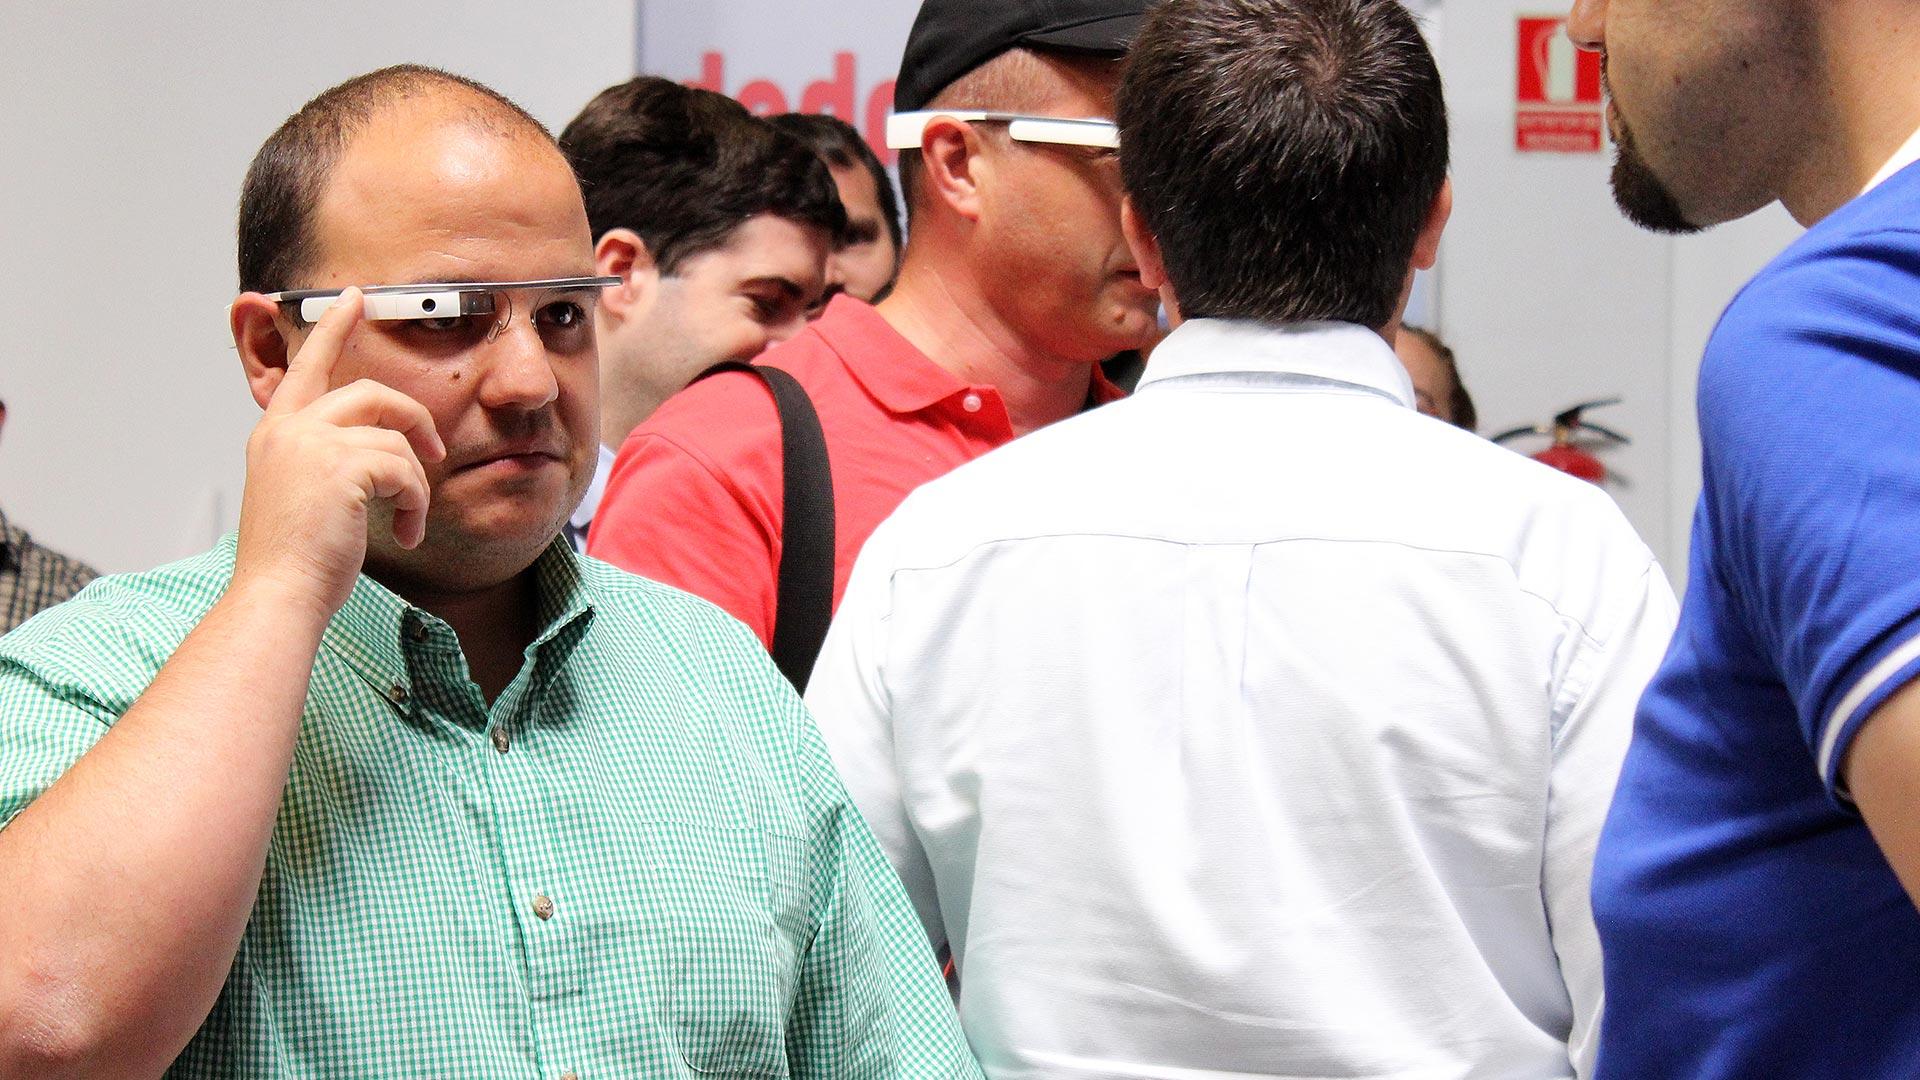 tpnet-eventos-encuentros-profesionales-iot-google-glasses-tester-3